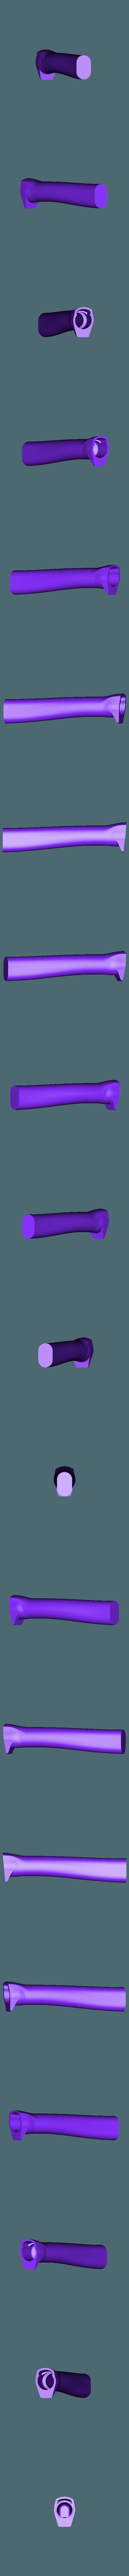 Zebco_Fishing_Handle_v1-2_Platinum.STL Download free STL file Fishing Pole v2 • Model to 3D print, WalterHsiao